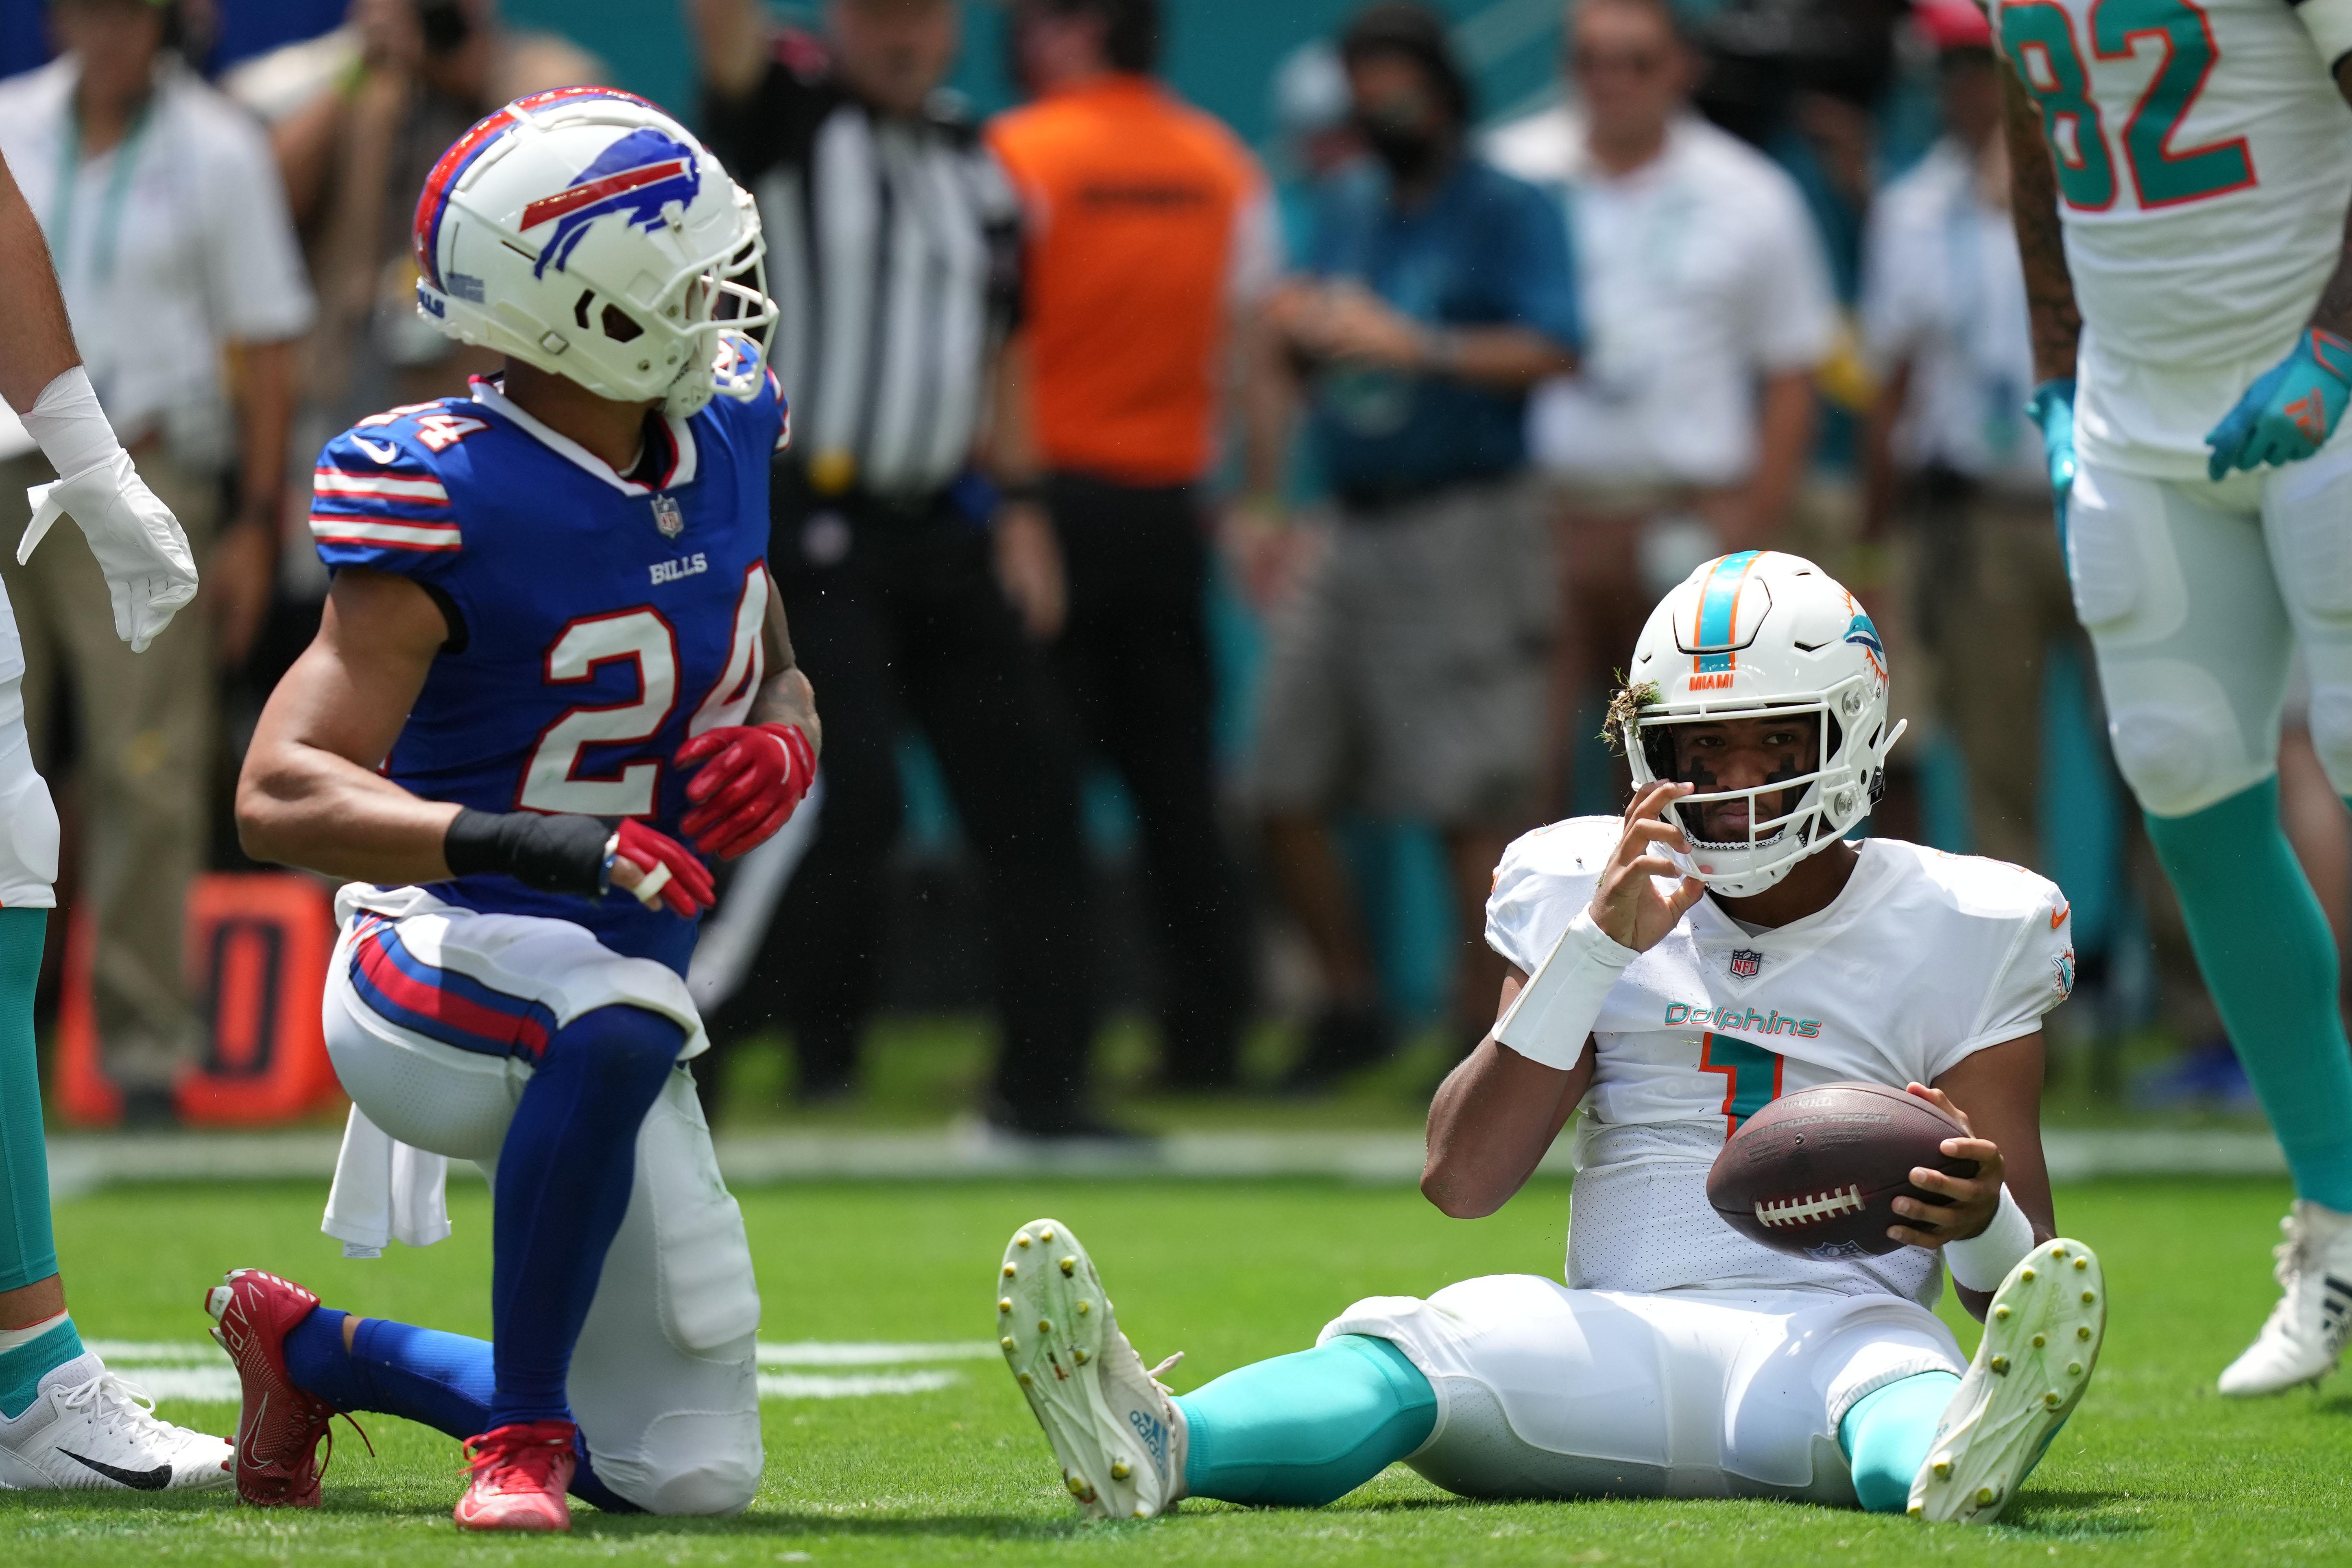 NFL: Buffalo Bills at Miami Dolphins